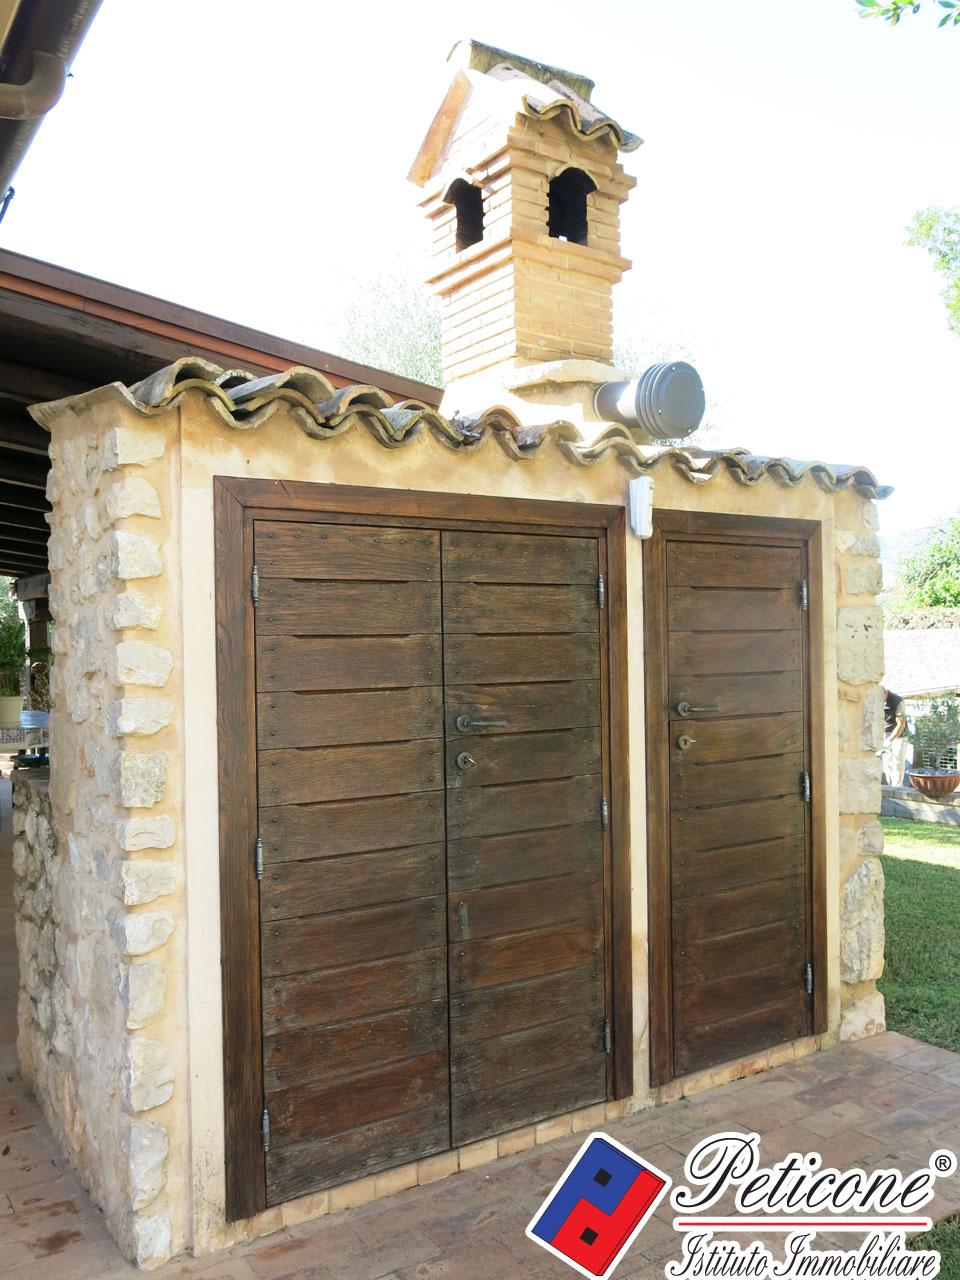 Villa in Vendita a Fondi: 3 locali, 107 mq - Foto 21